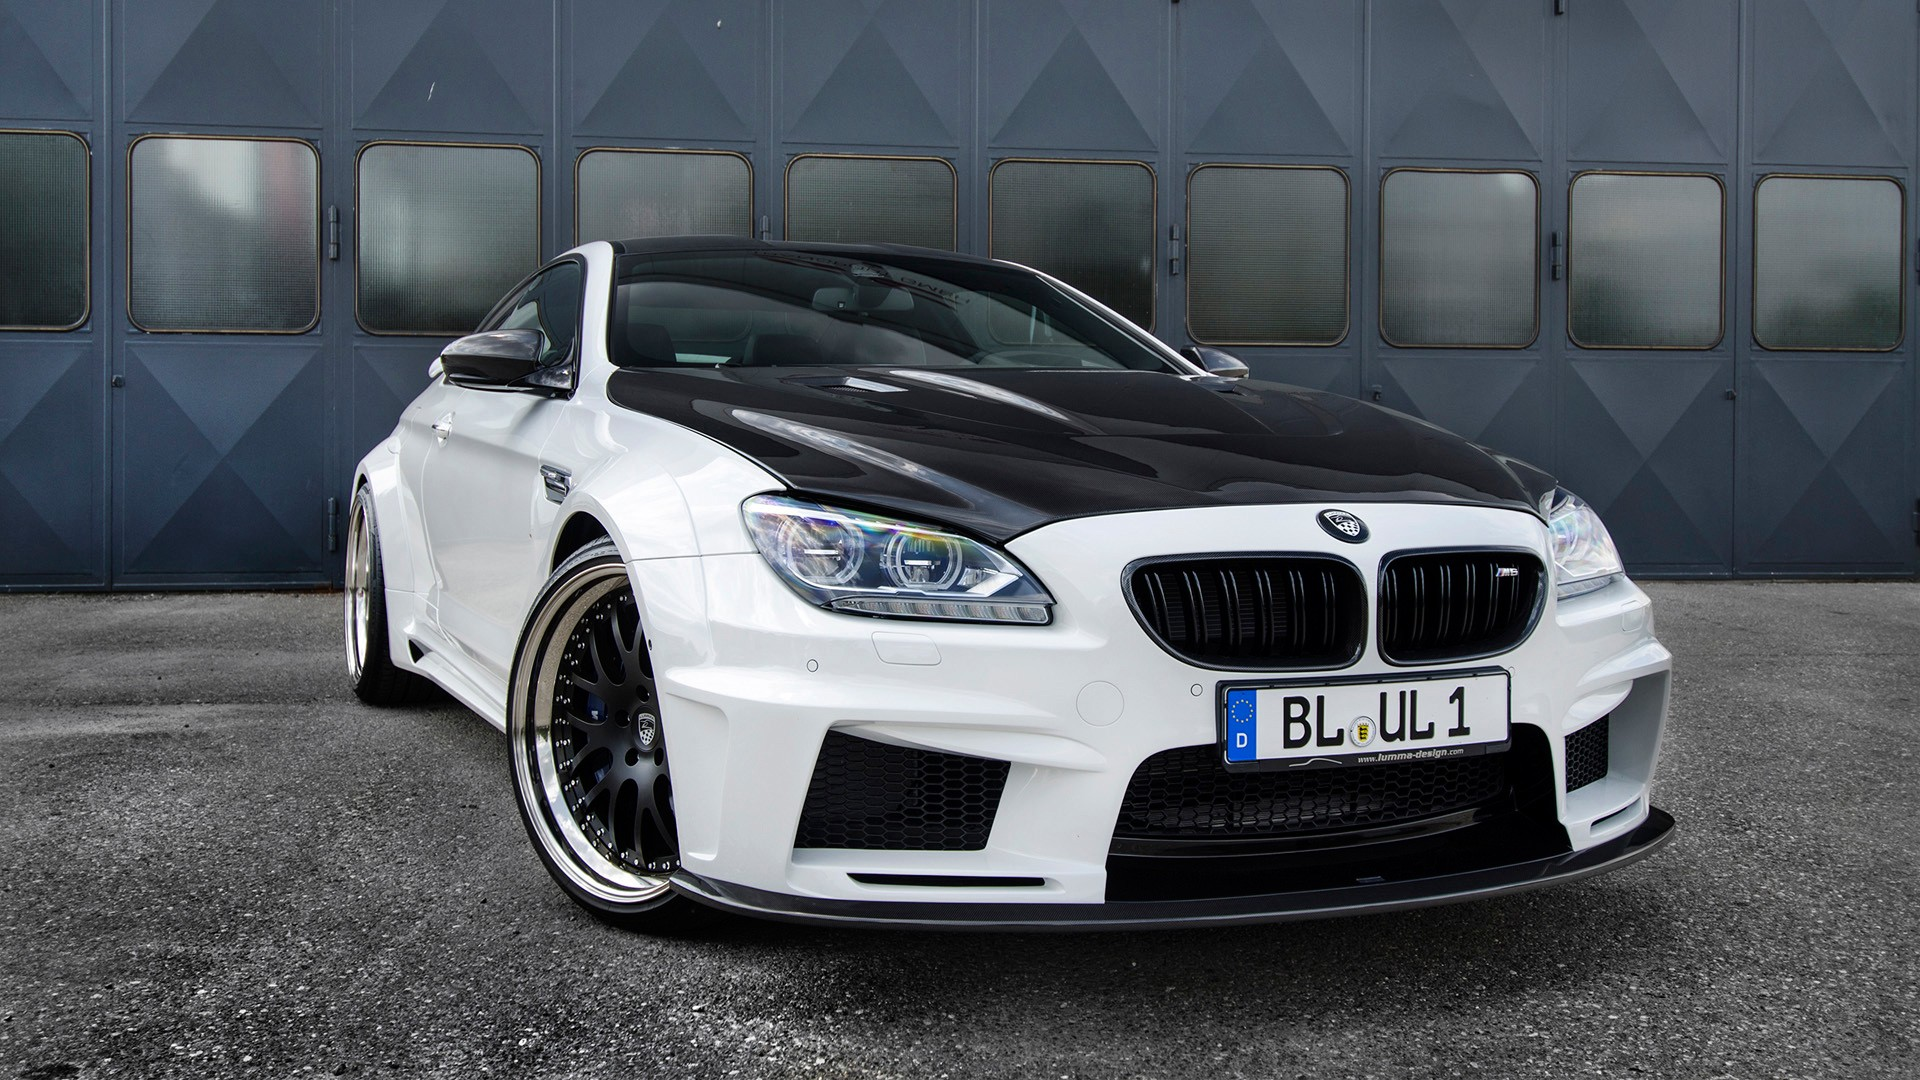 2013 BMW M6 By Lumma Design Wallpaper | HD Car Wallpapers ...